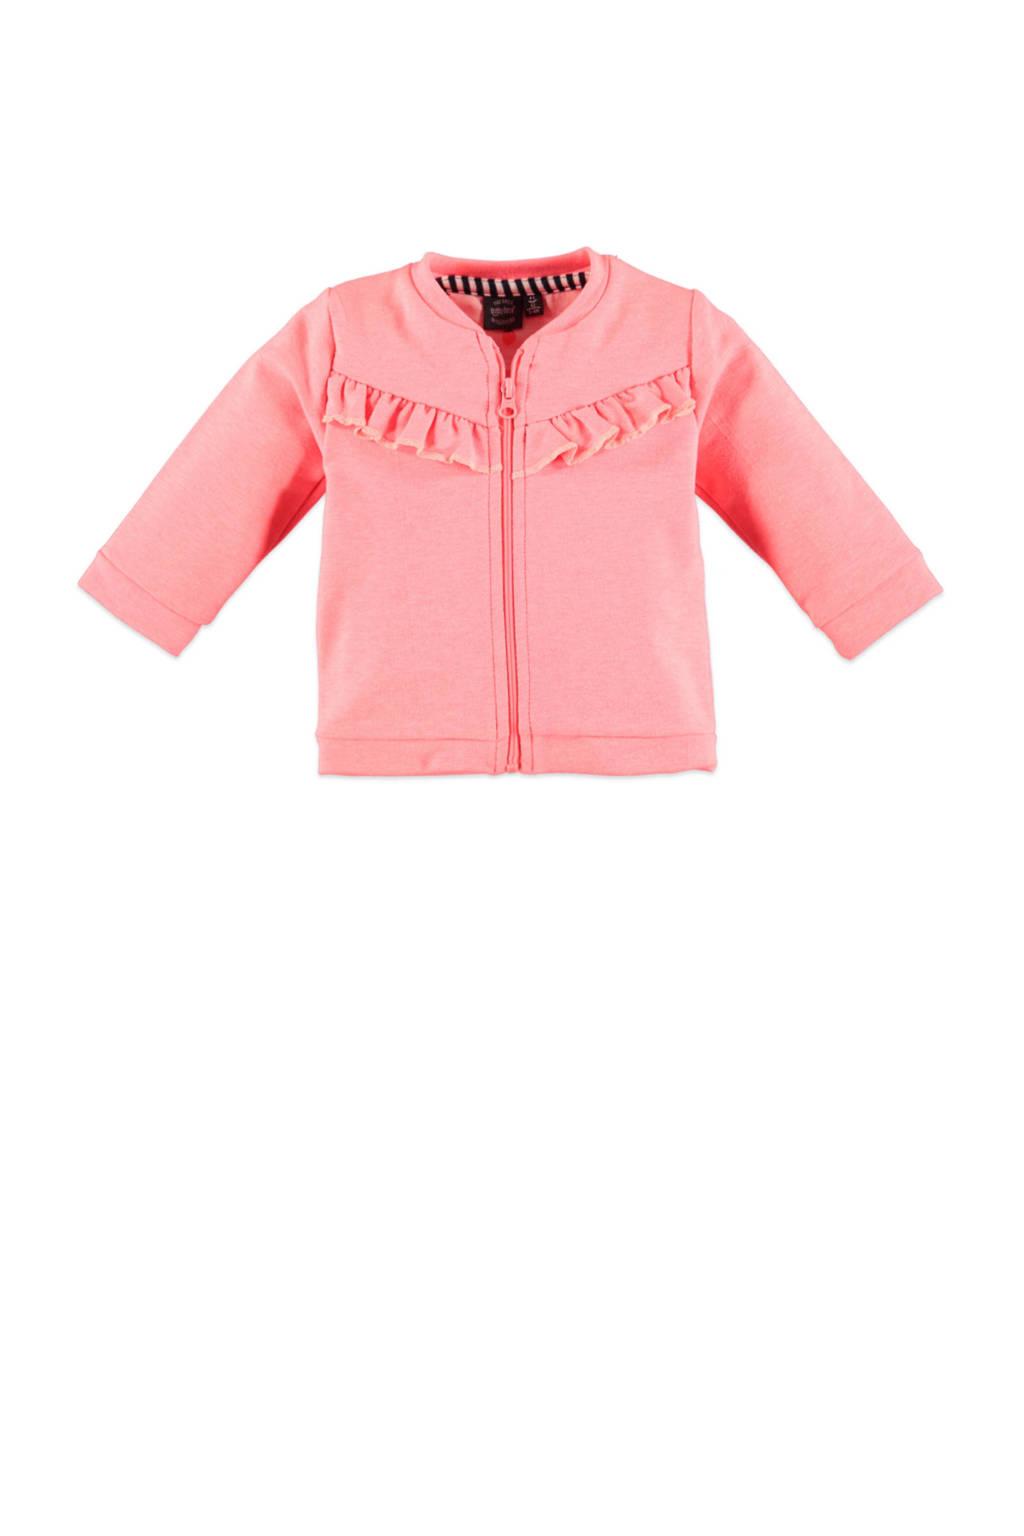 Babyface baby fleece vest en ruches roze, Roze